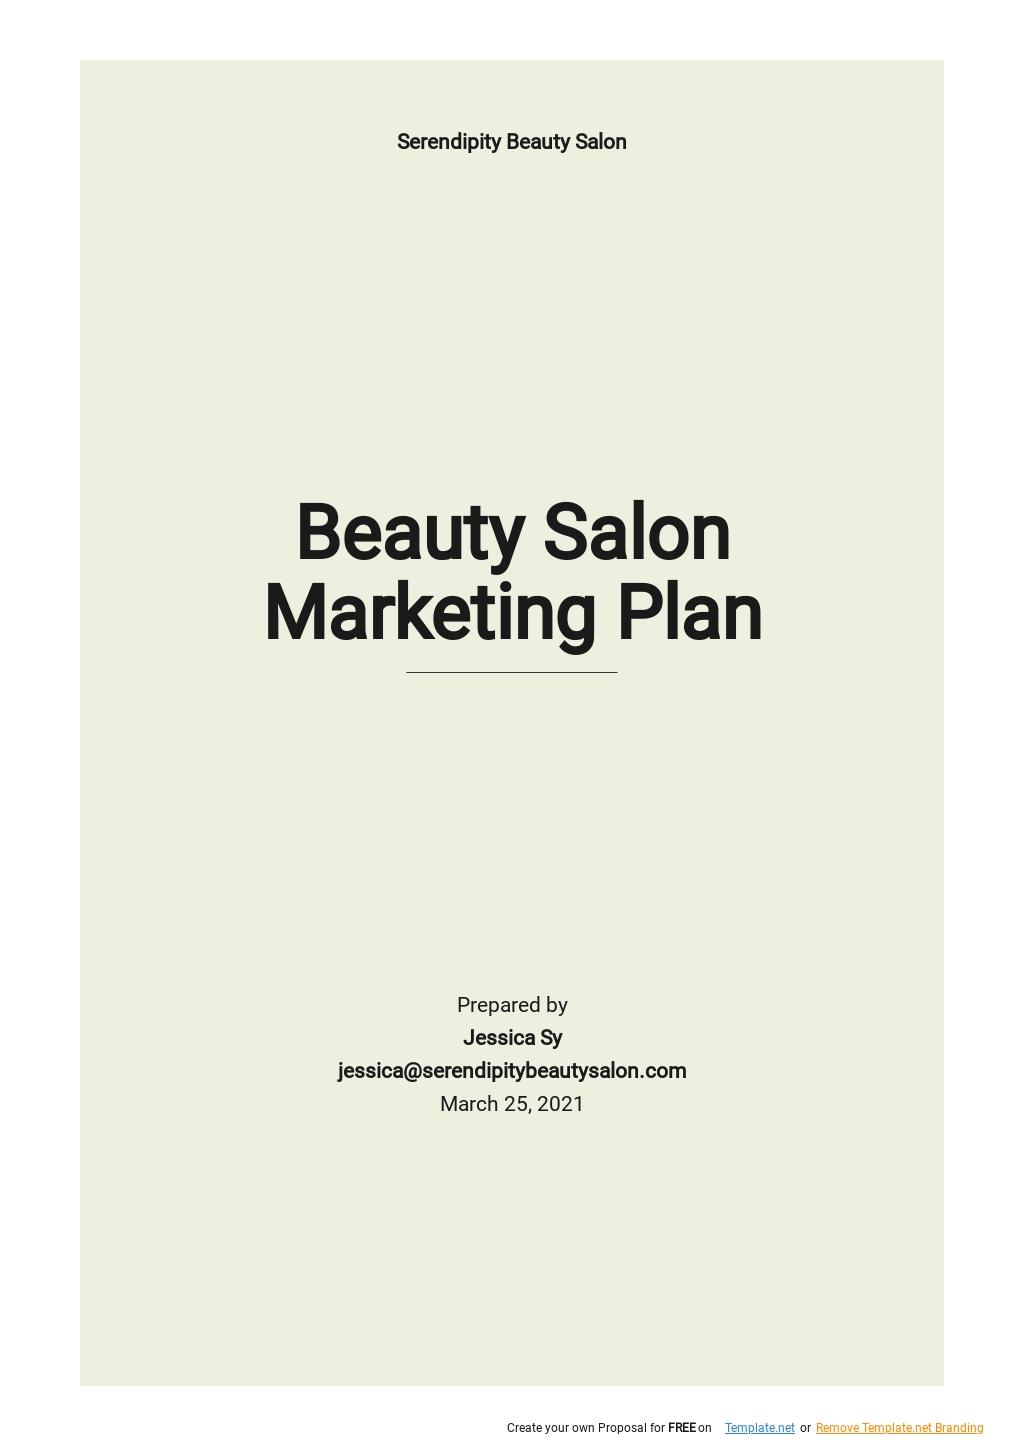 Beauty Salon Marketing Plan Template